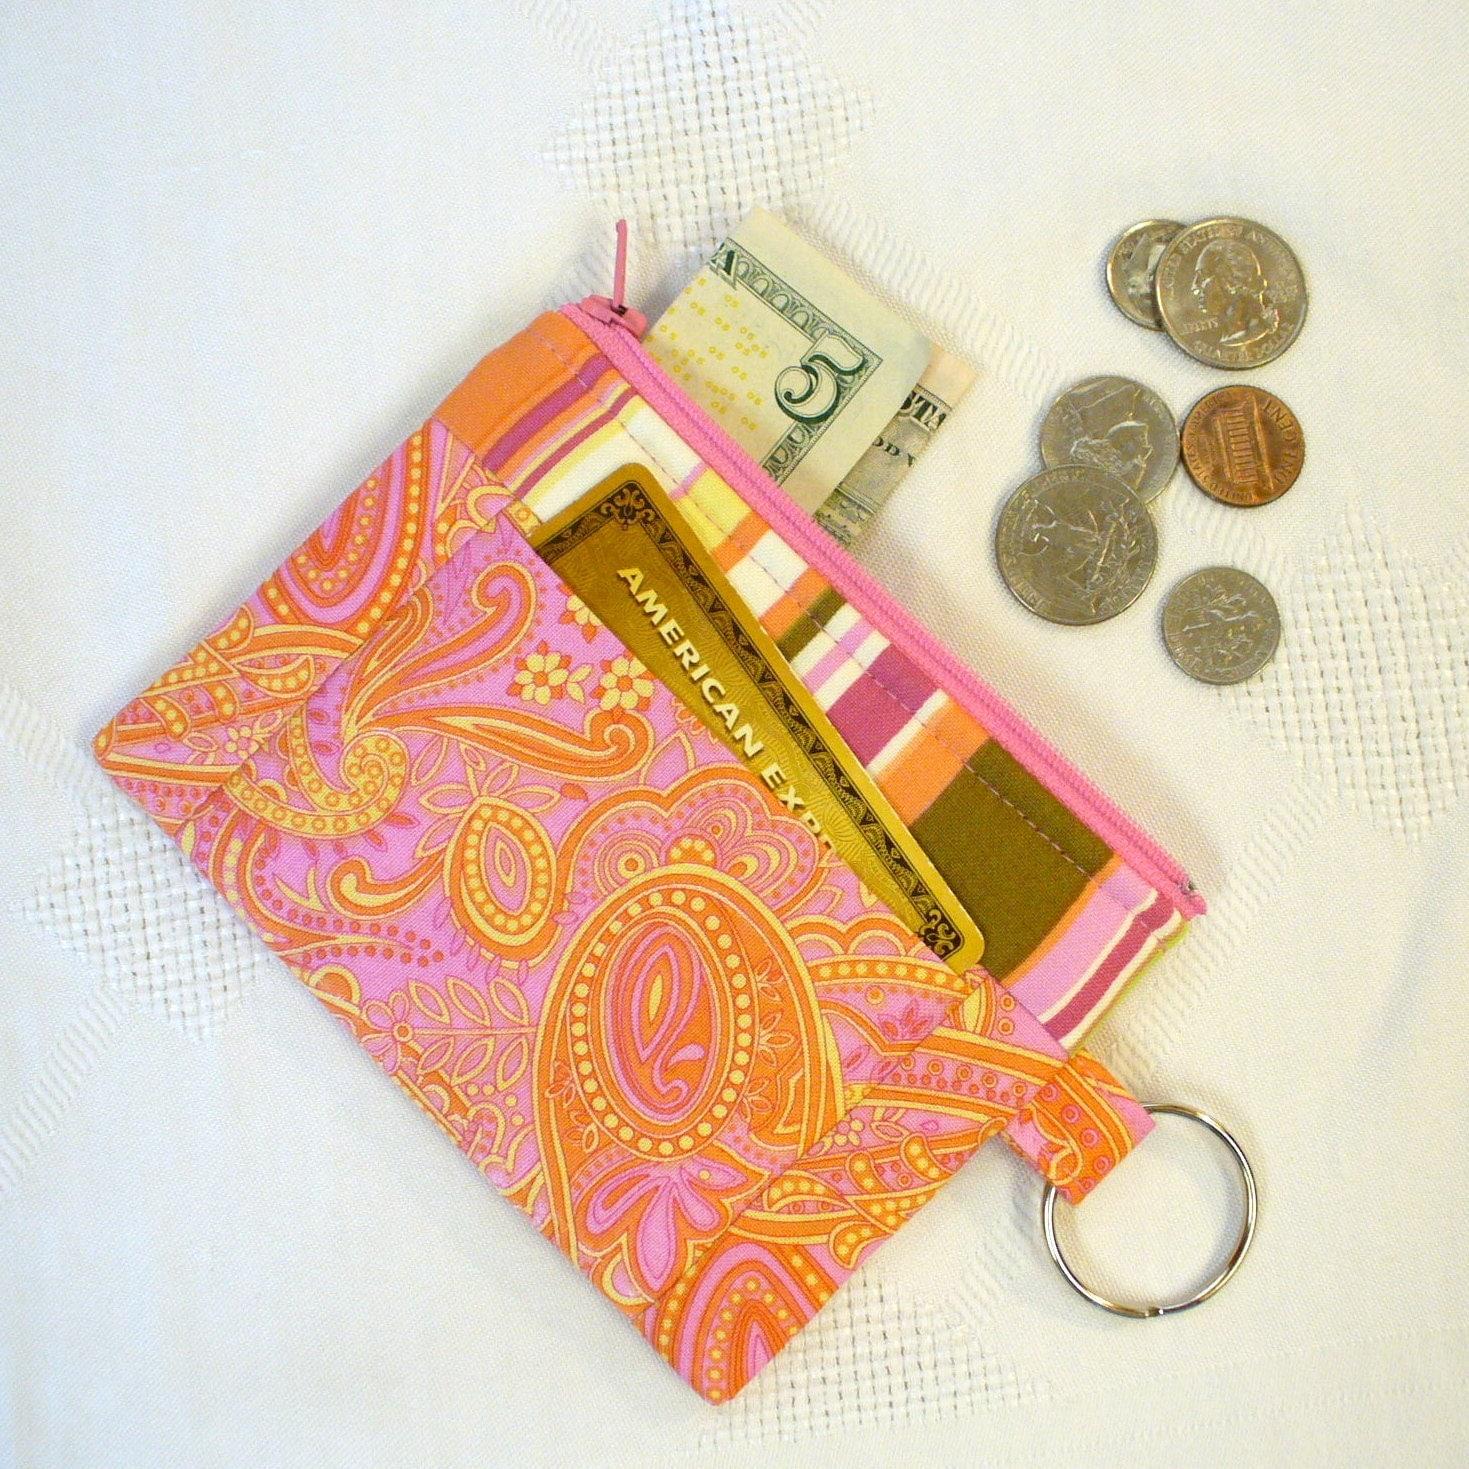 Card slot purse